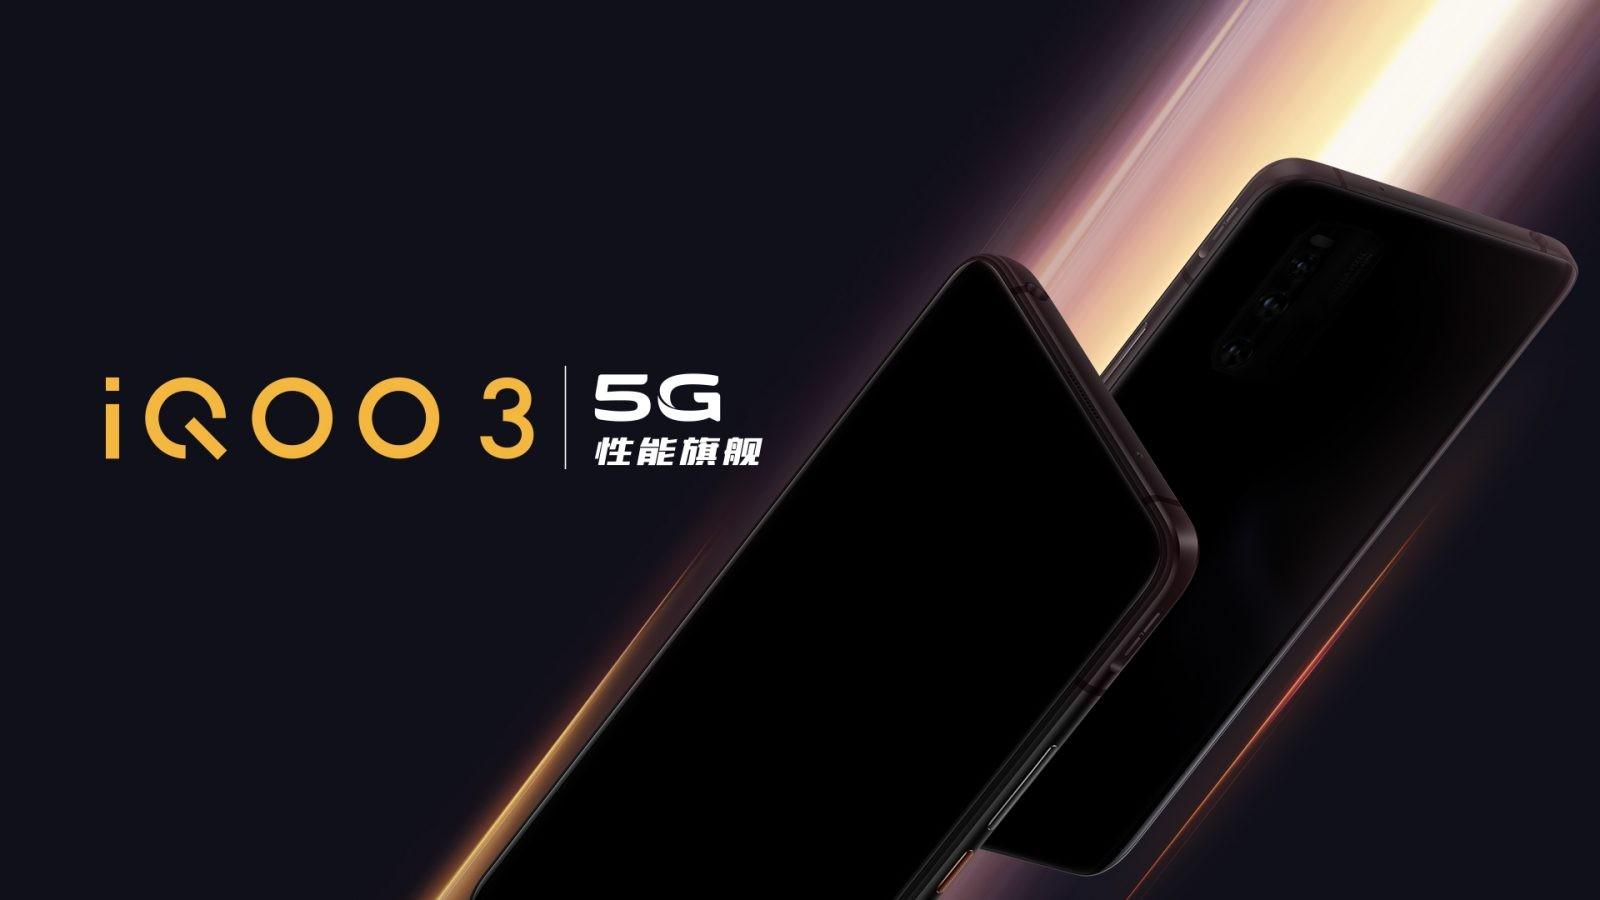 iQoo 3 is said to come with 5G Capabilities